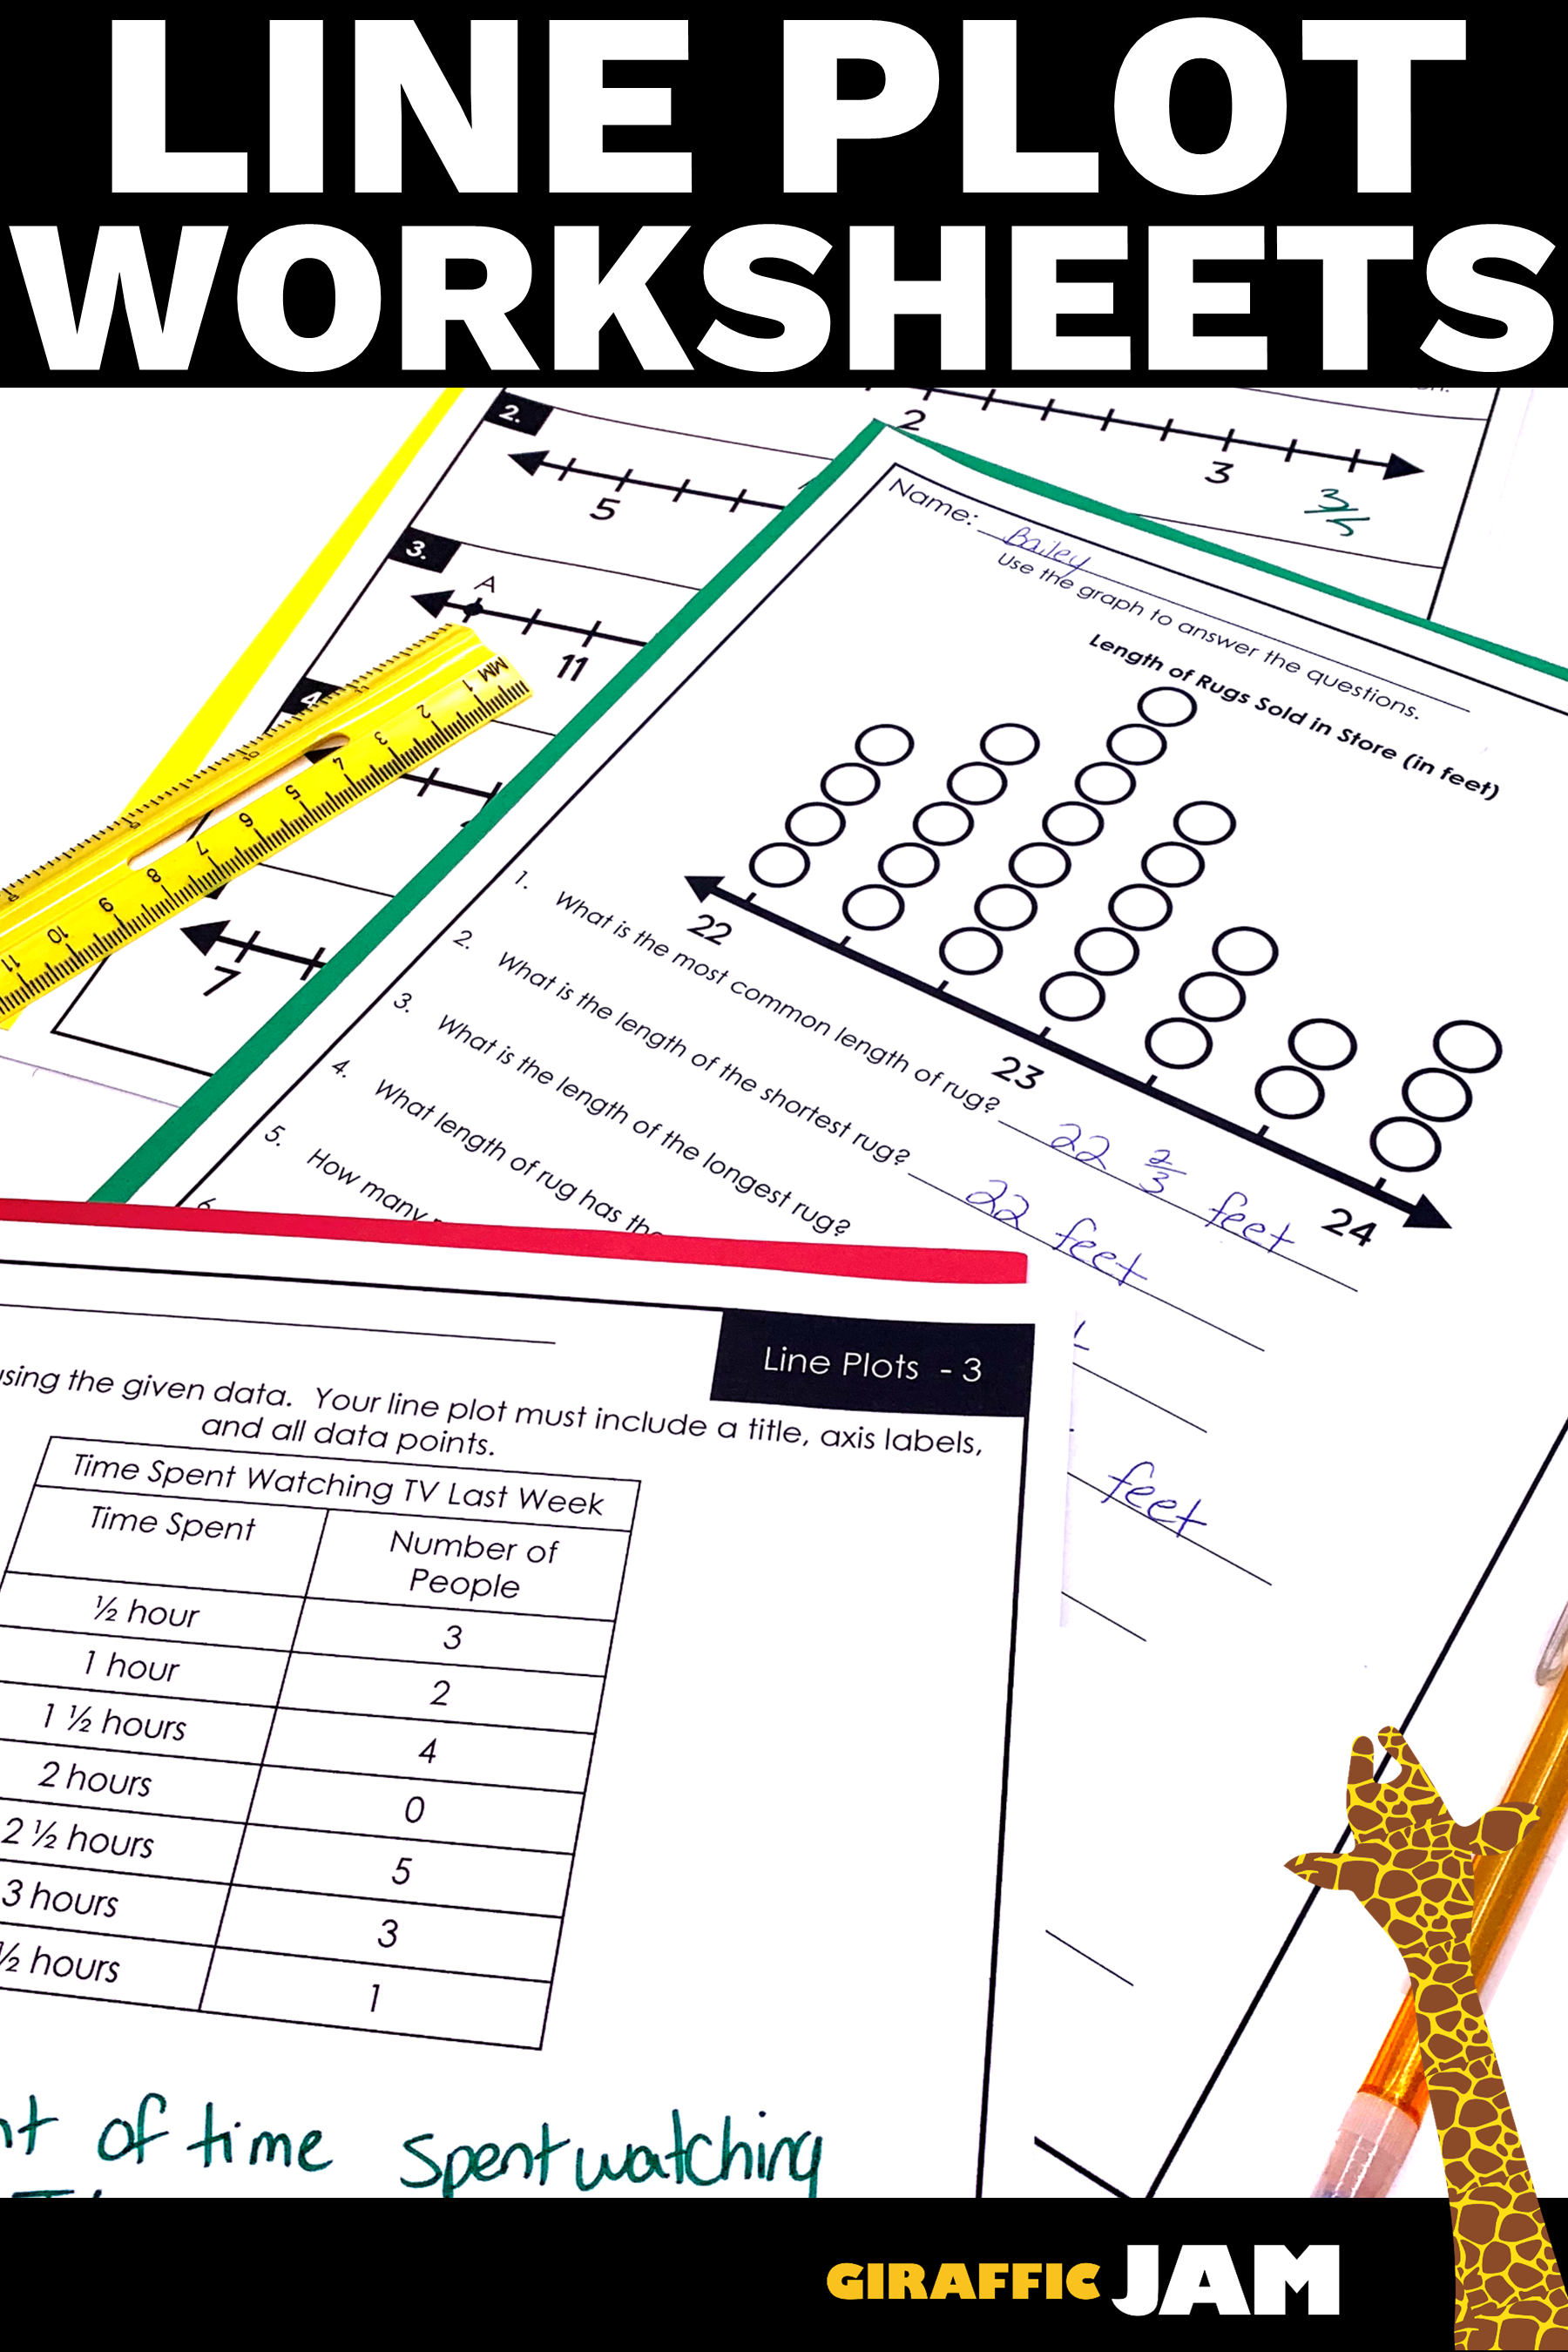 4th Grade Line Plots Interpreting Line Plots Measurement Worksheets 4th Grade Math Measurement Worksheets Line Plot Worksheets 4th Grade Math Worksheets [ 2700 x 1800 Pixel ]